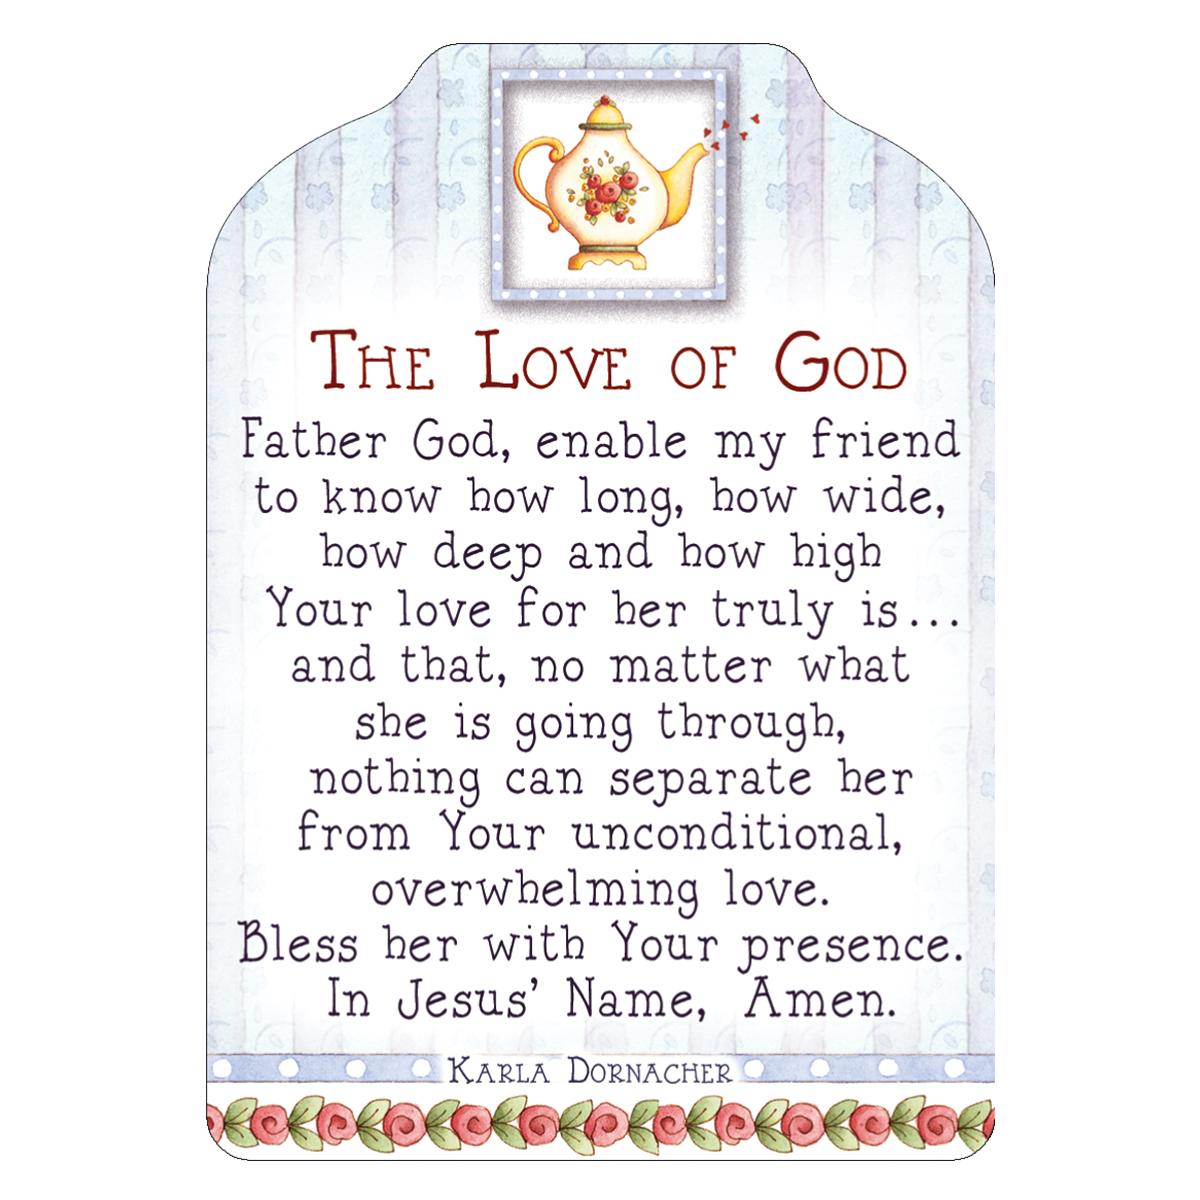 Friendship Card With Envelope: The Love Of God   Karla Dornacher